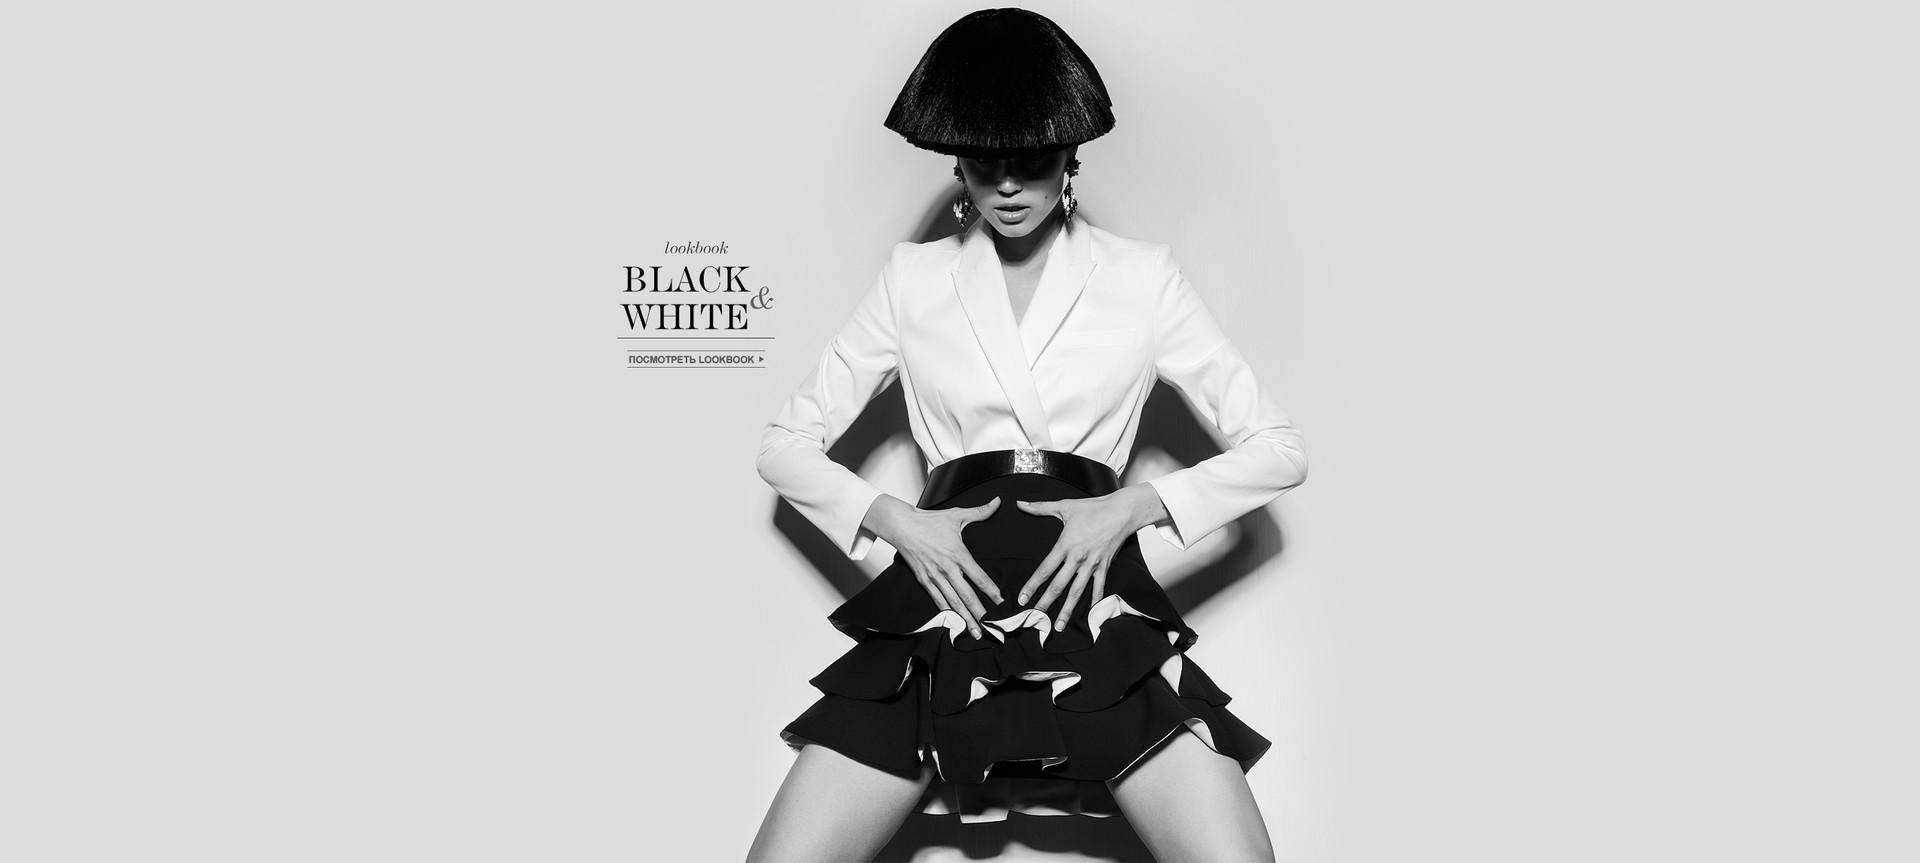 Lookbook BLACK&WHITE